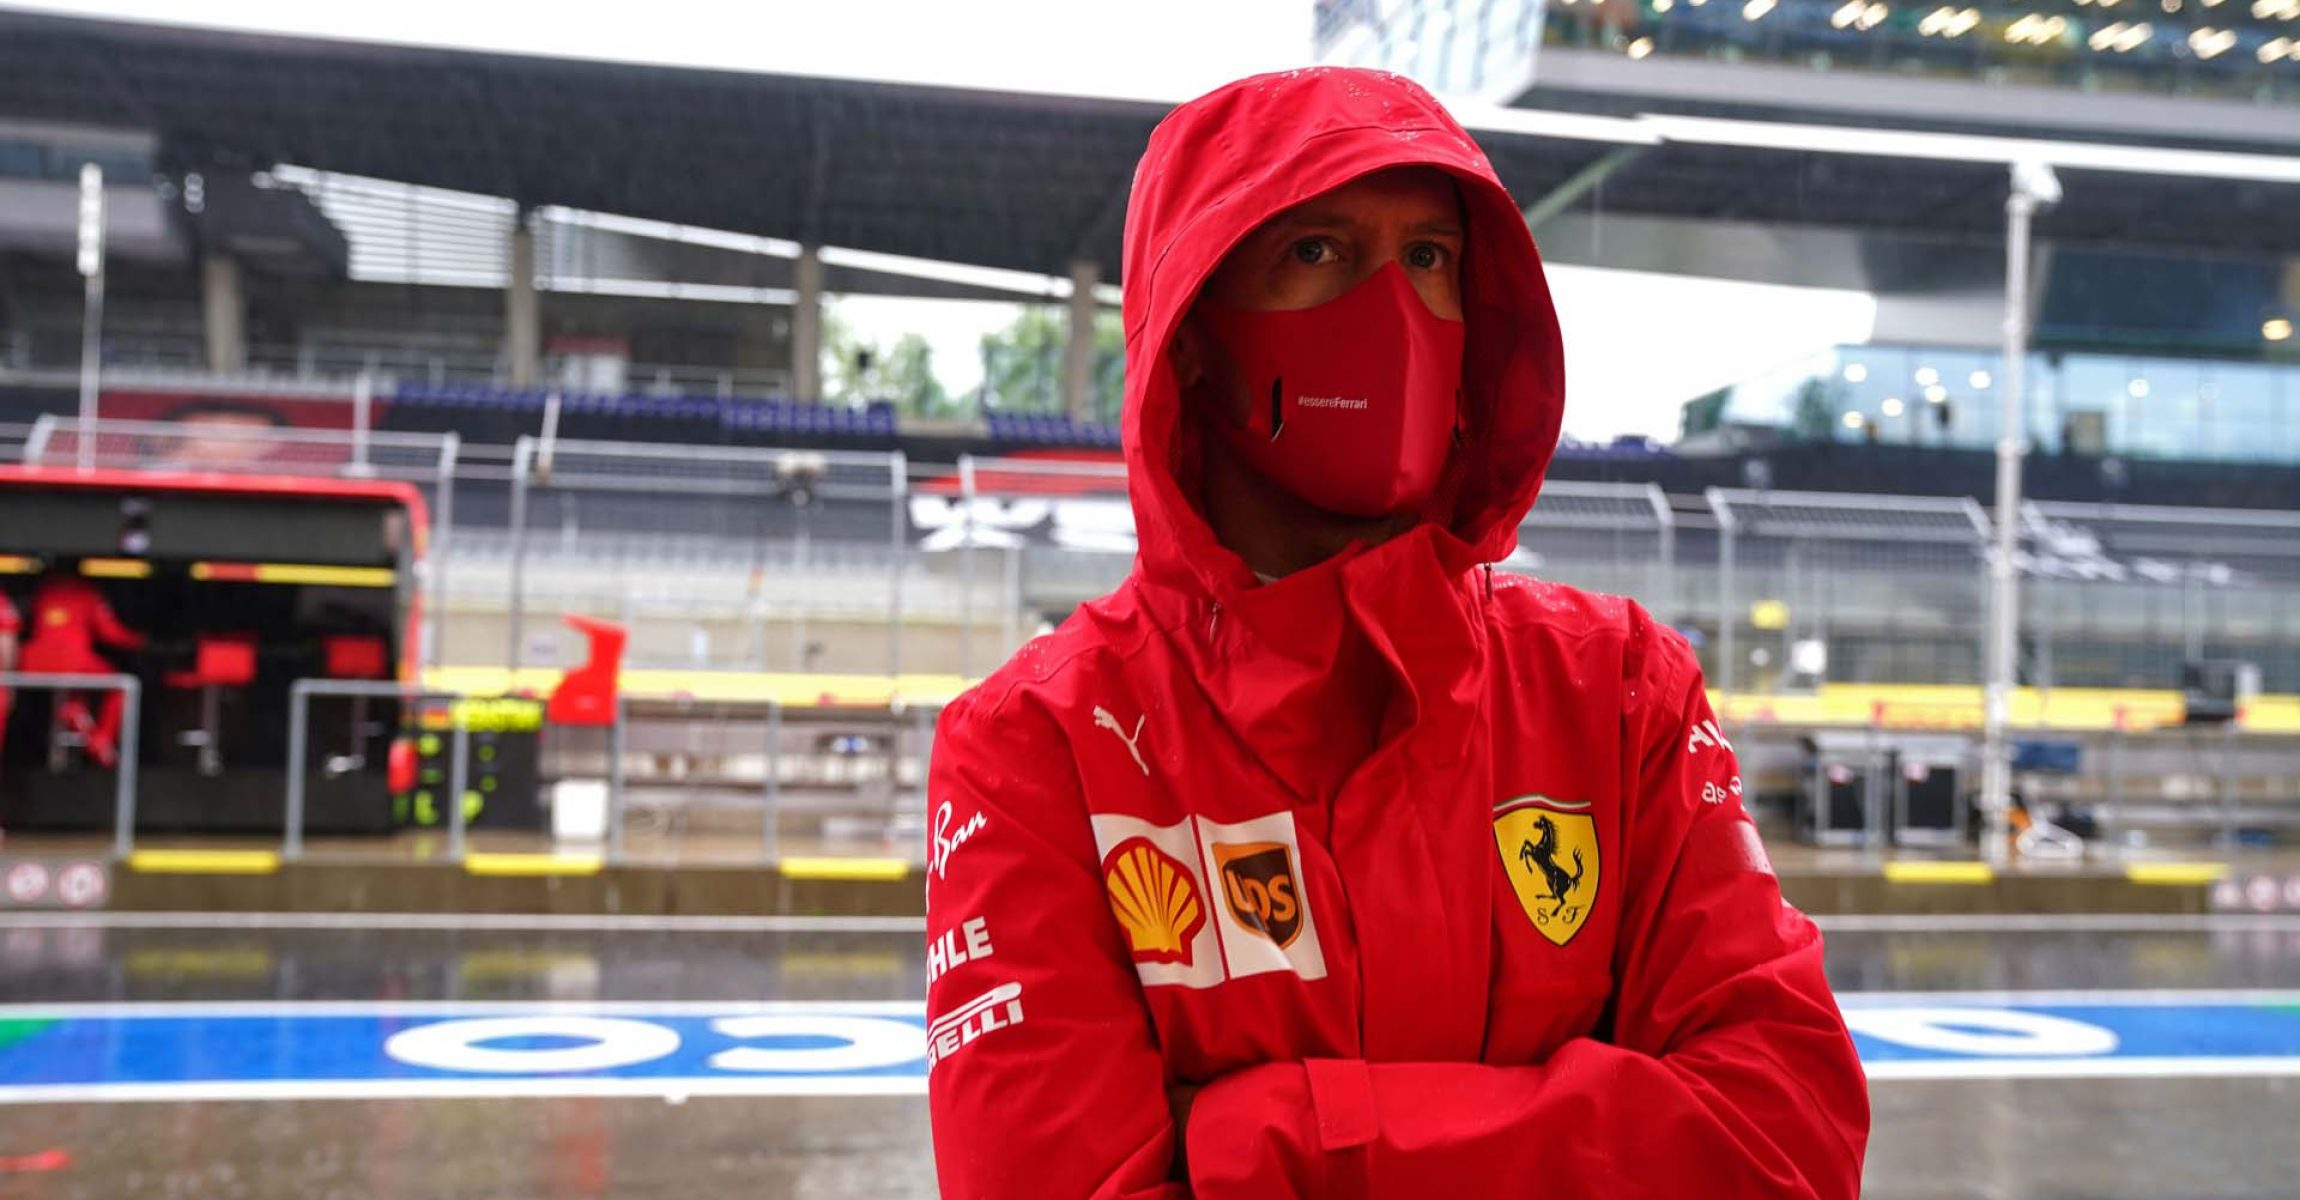 GP STYRIA F1/2020 - SABATO 11/07/2020 credit: @Scuderia Ferrari Press Office Sebastian Vettel